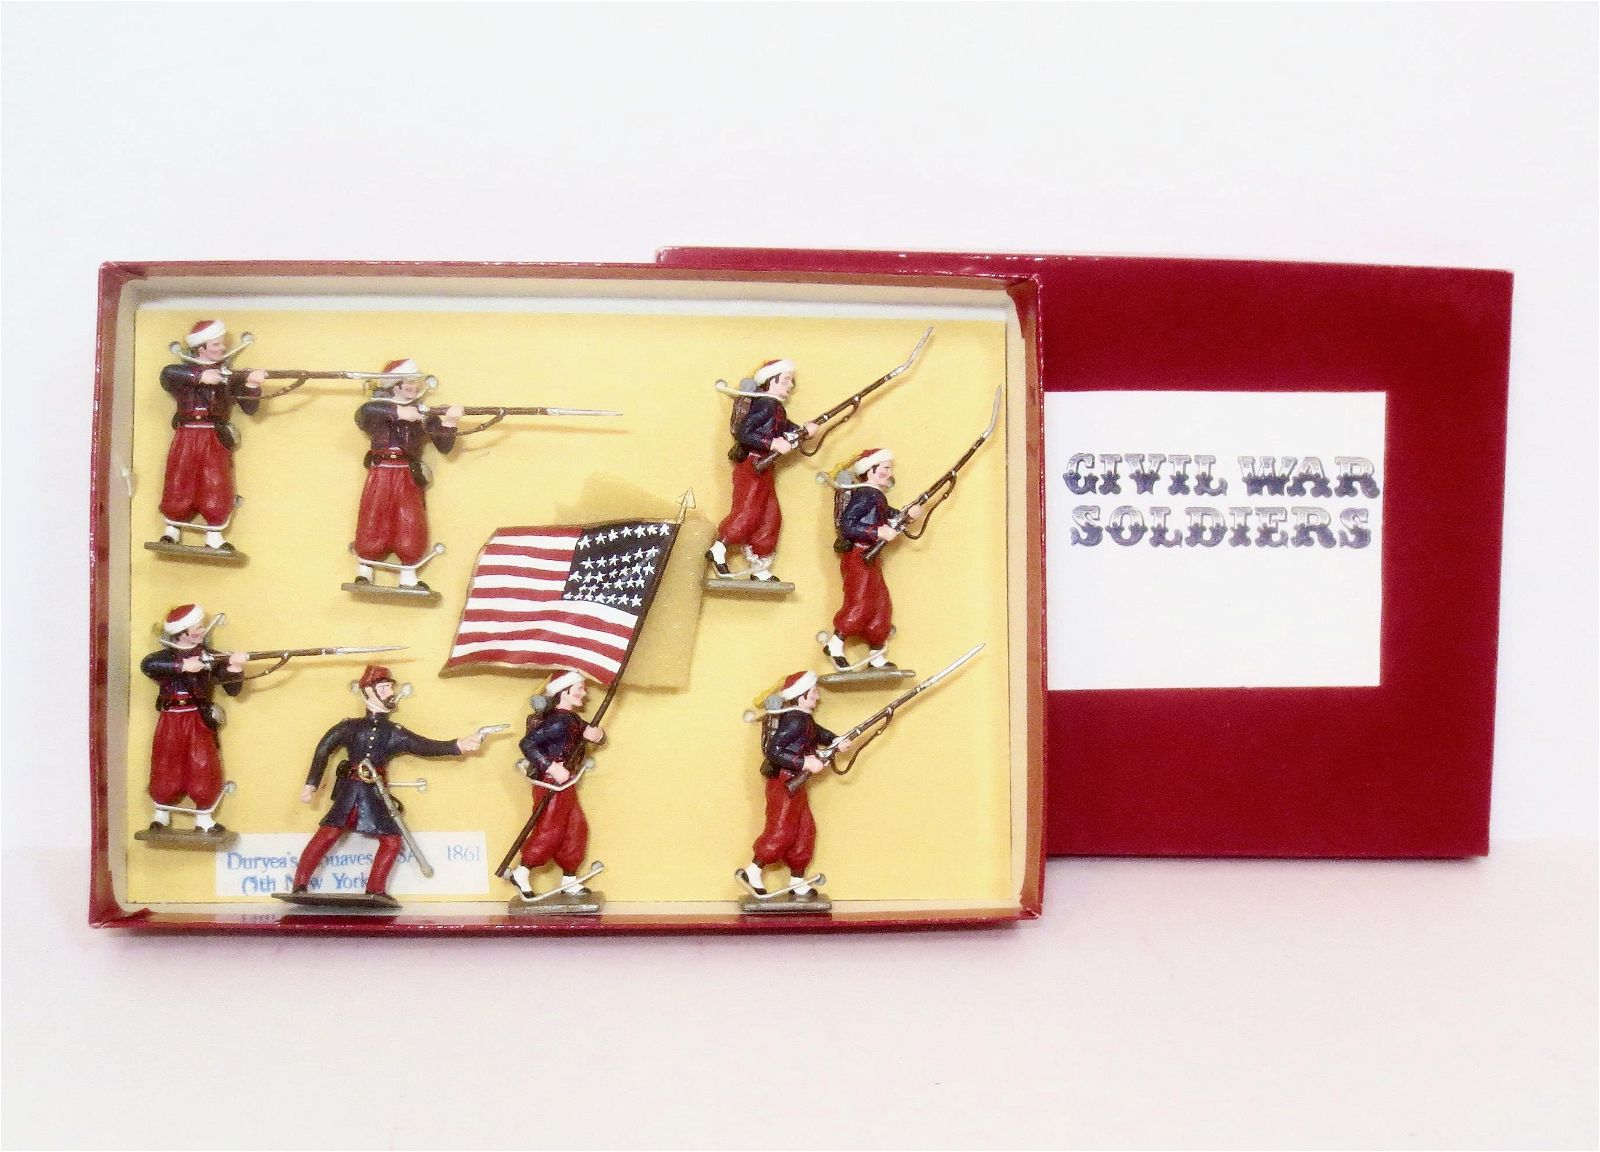 Civil War Soldiers Duryea's 5th New York Zouaves